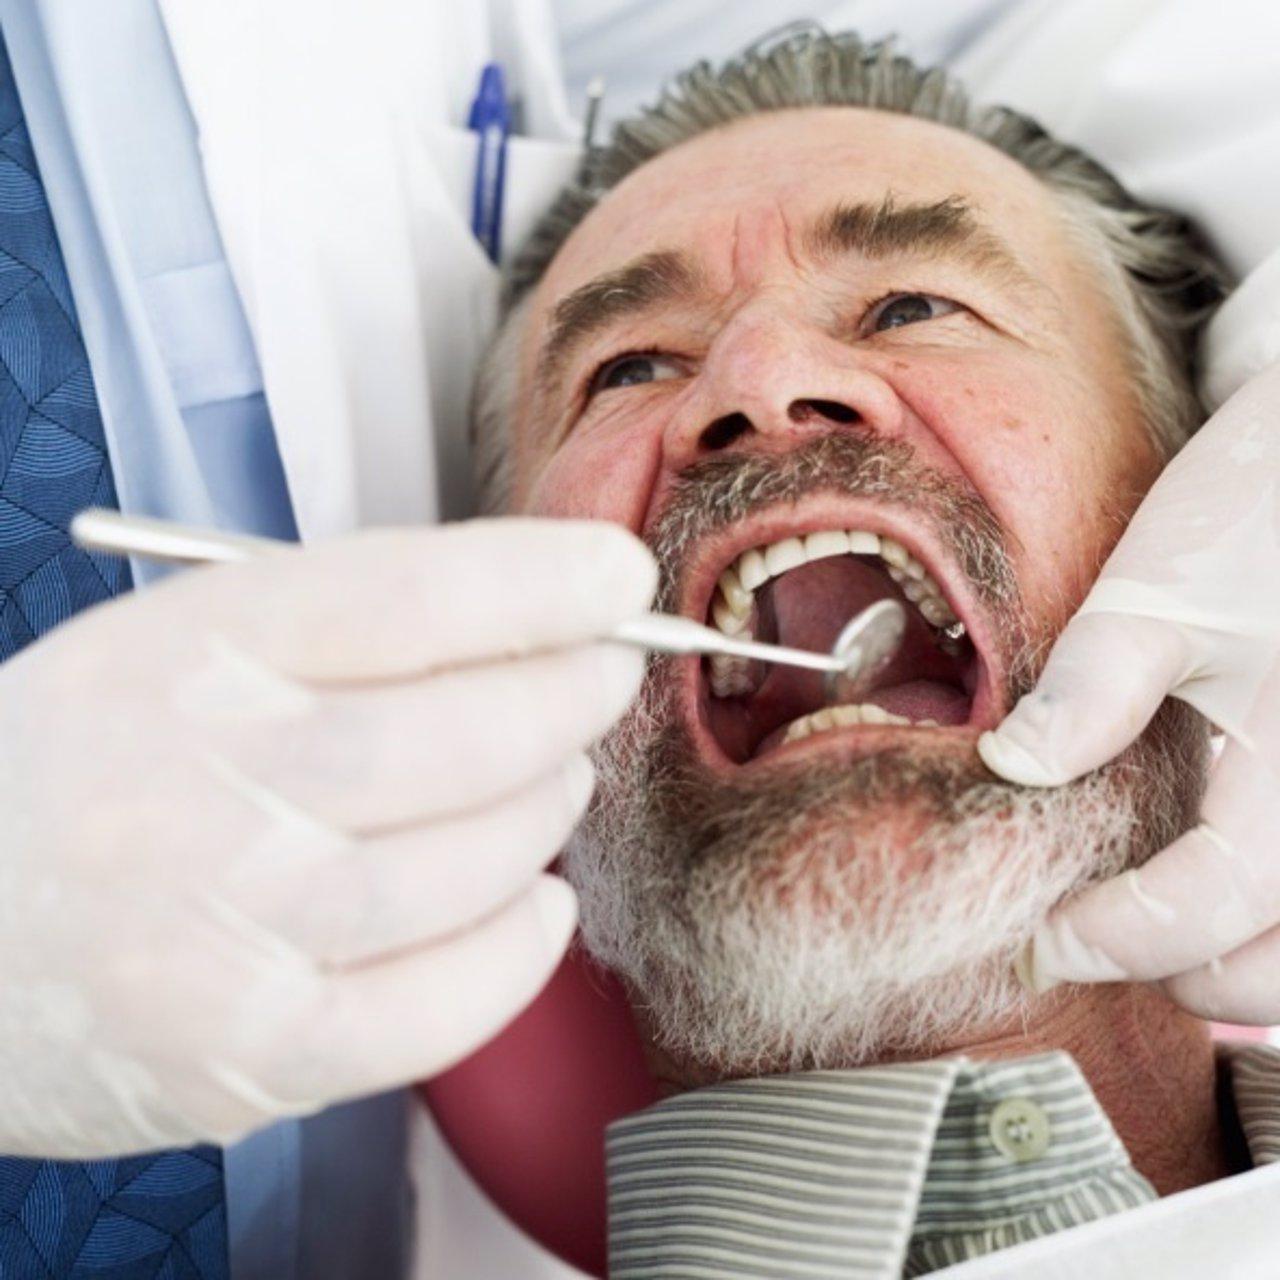 Hombre, dentista, cáncer oral